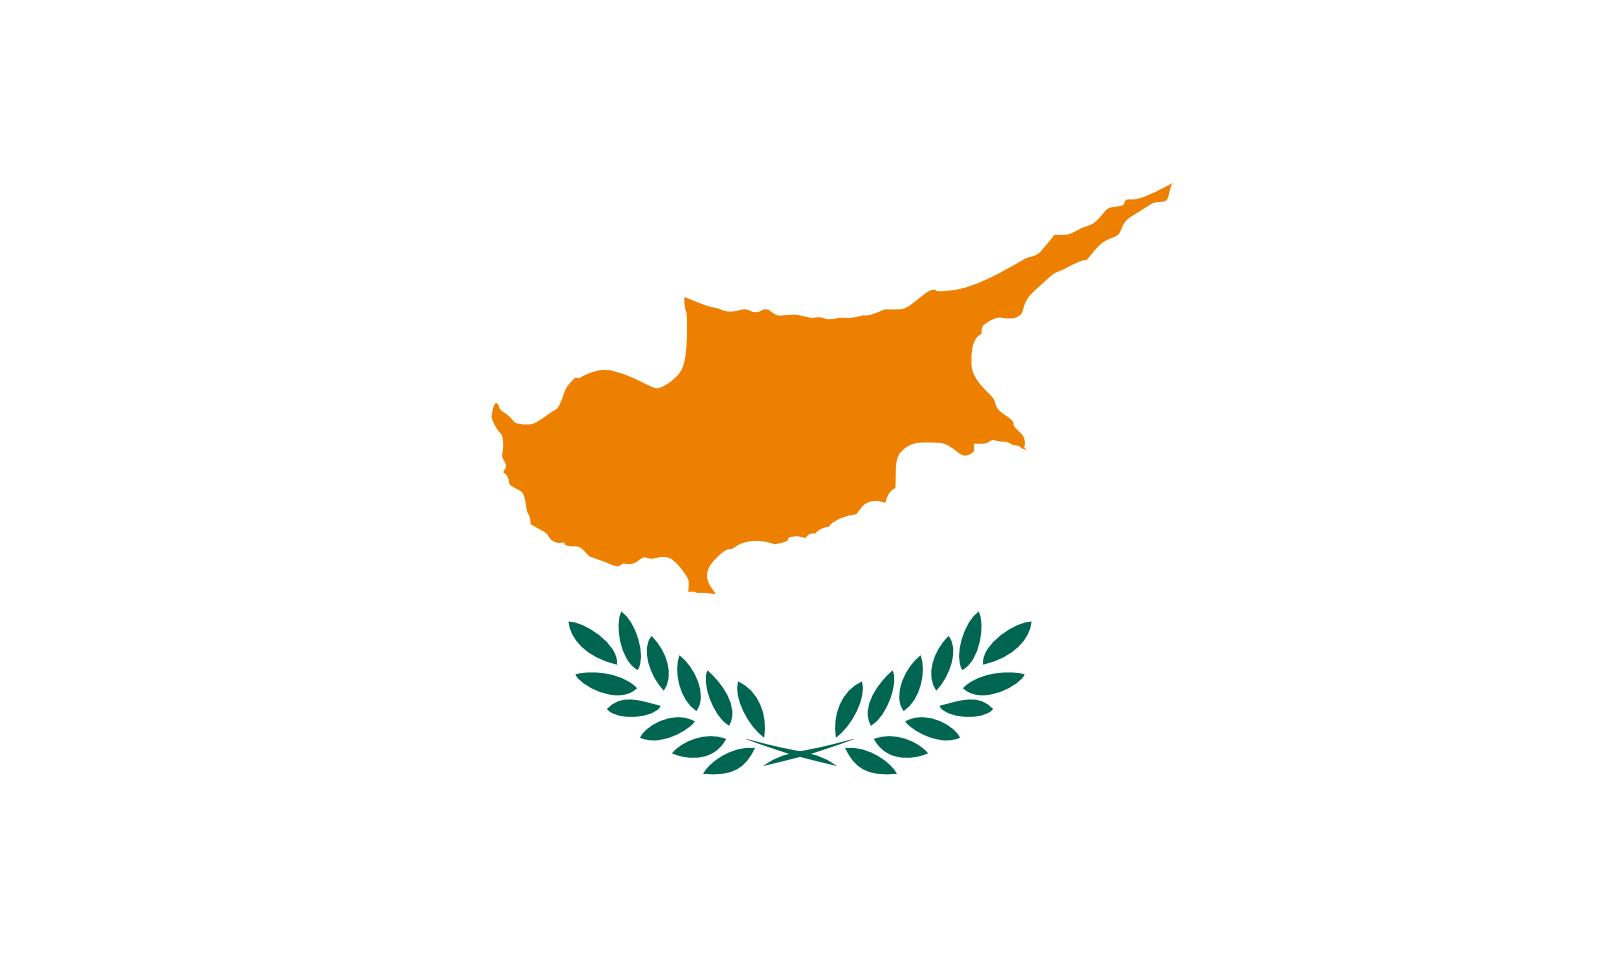 National Flag Of Cyprus